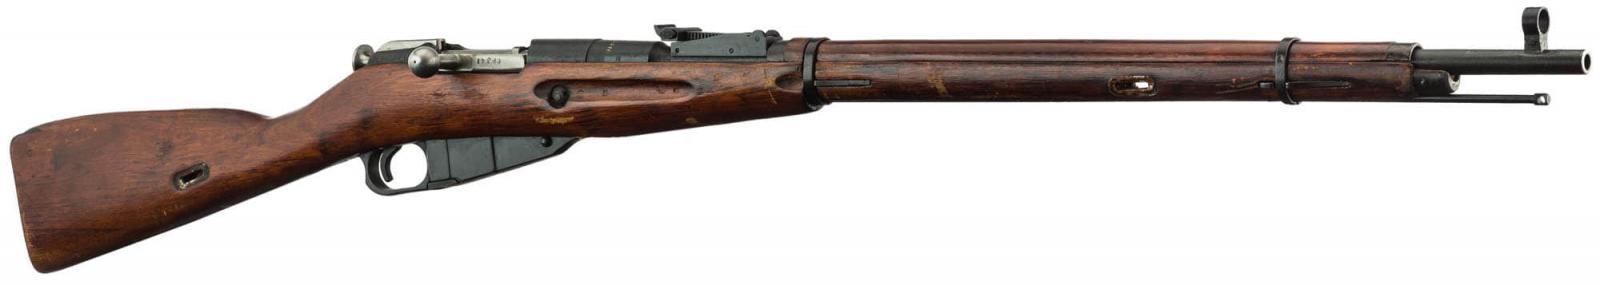 Carabine TAR MOSIN NAGANT 1891-1930 standart 7.62x54R